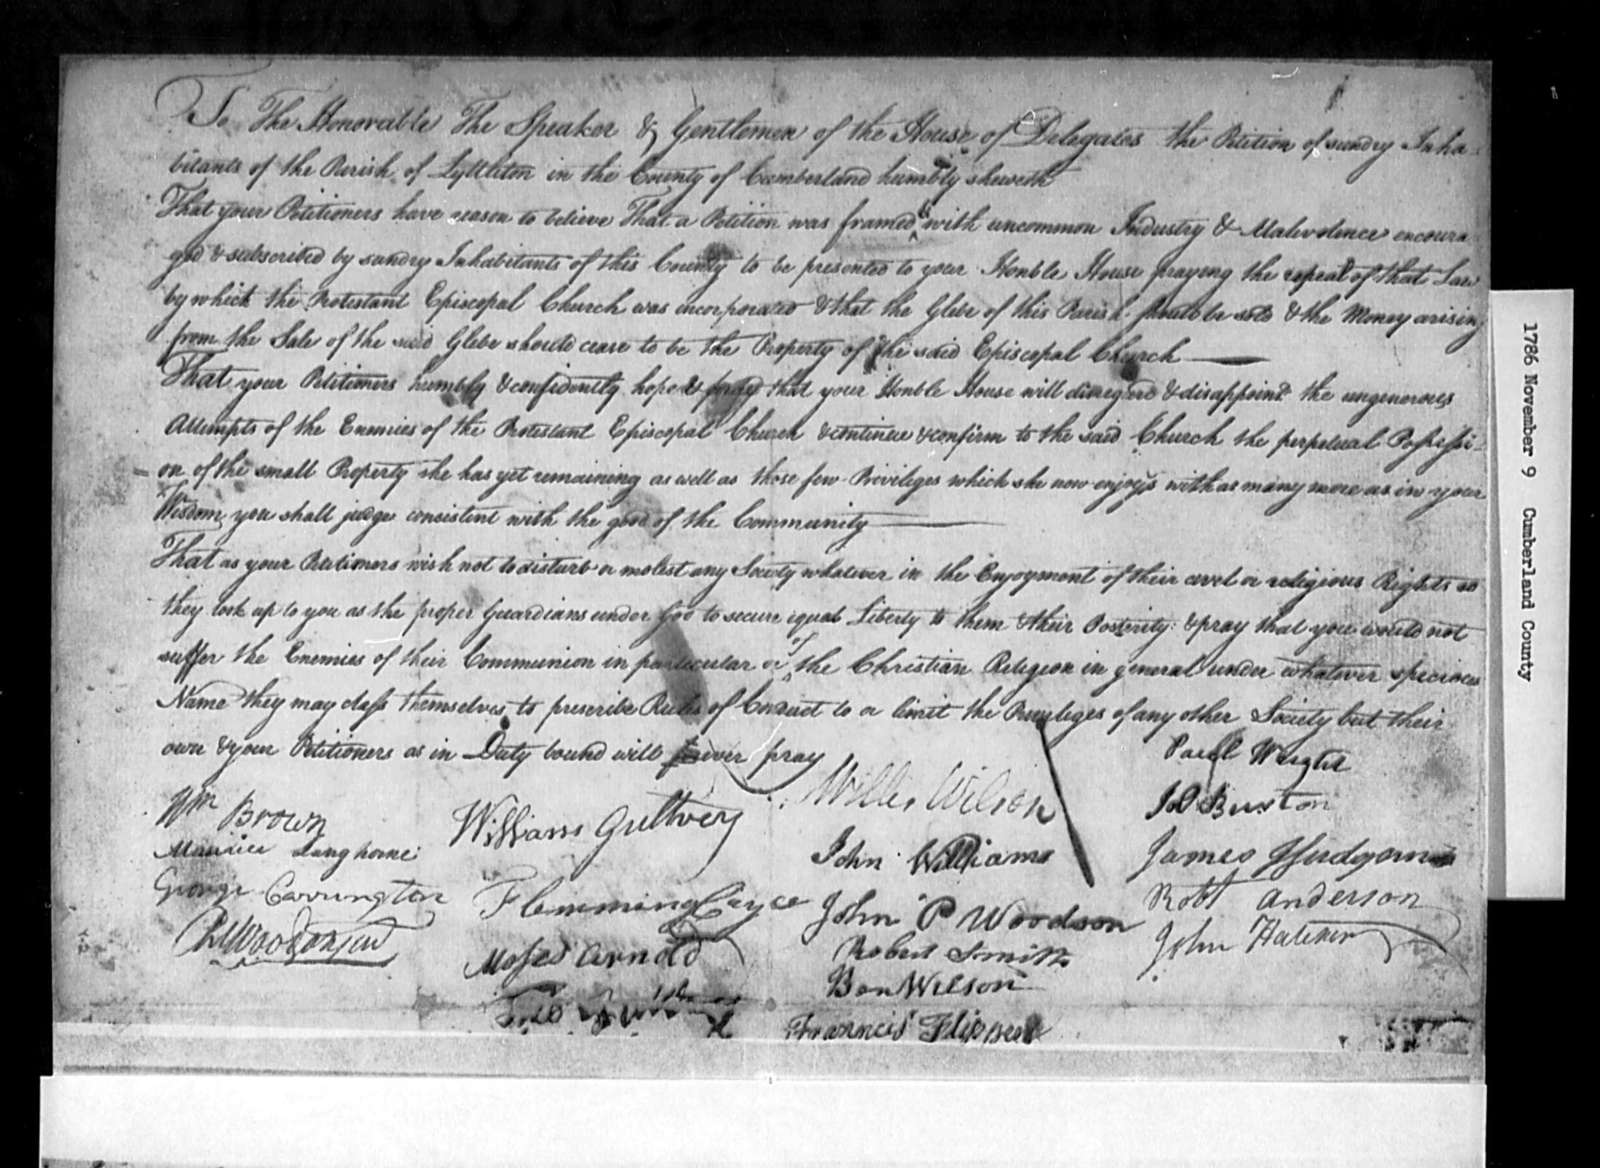 November 9, 1786, Cumberland, Lyttleton Parish, opposed to repeal.